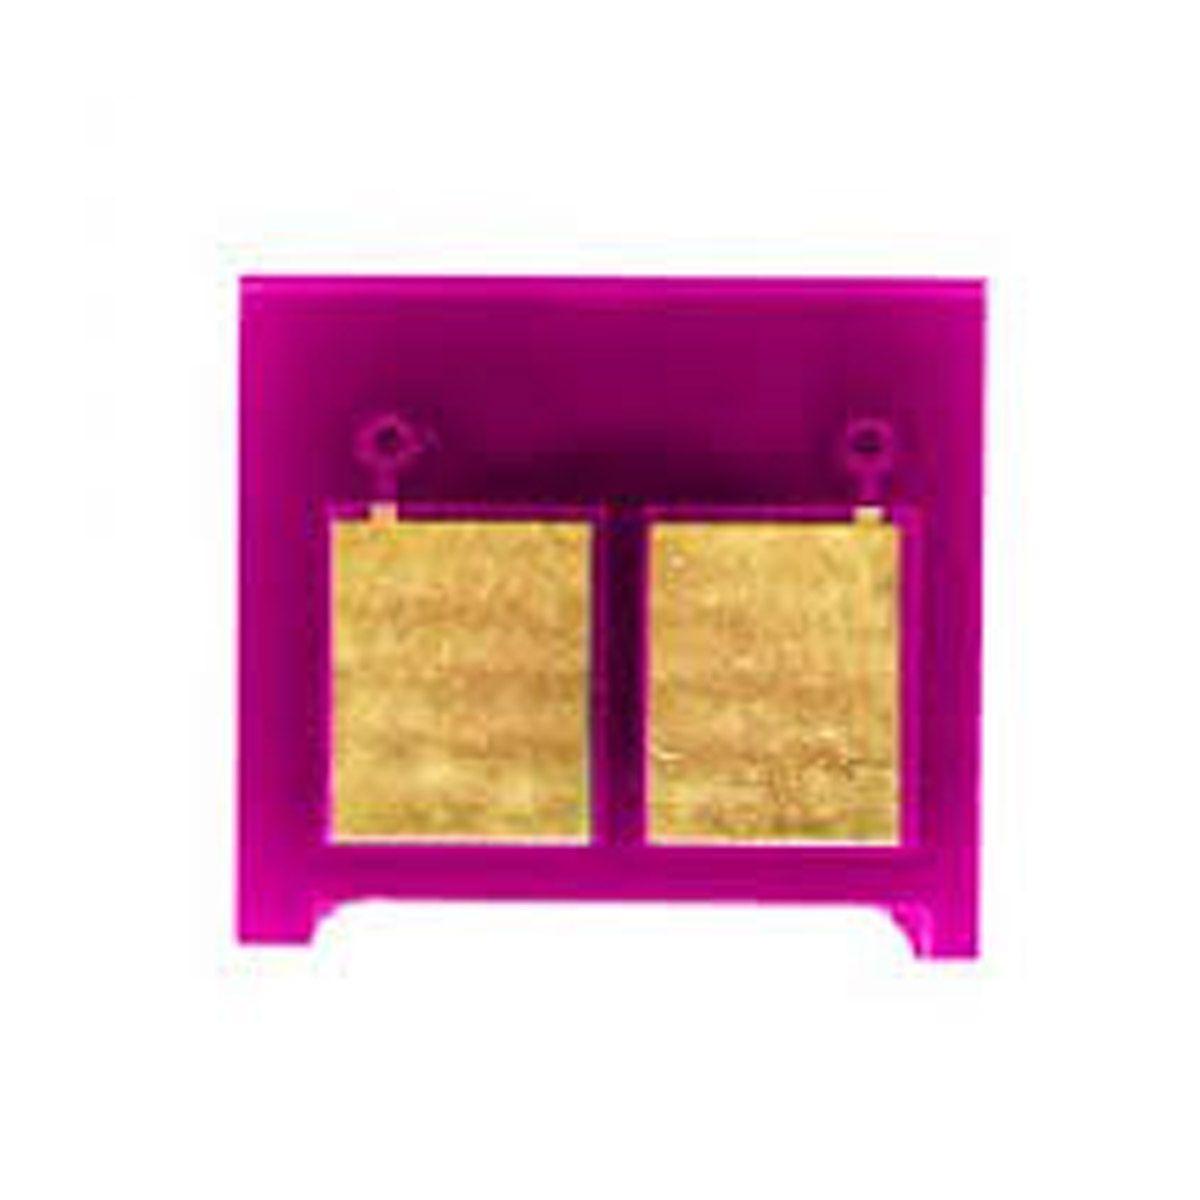 Chip HP CE313A CE313 313A 126A - CP1020 CP1020WN CP1025 M175 M175A M176N - Magenta - 1K